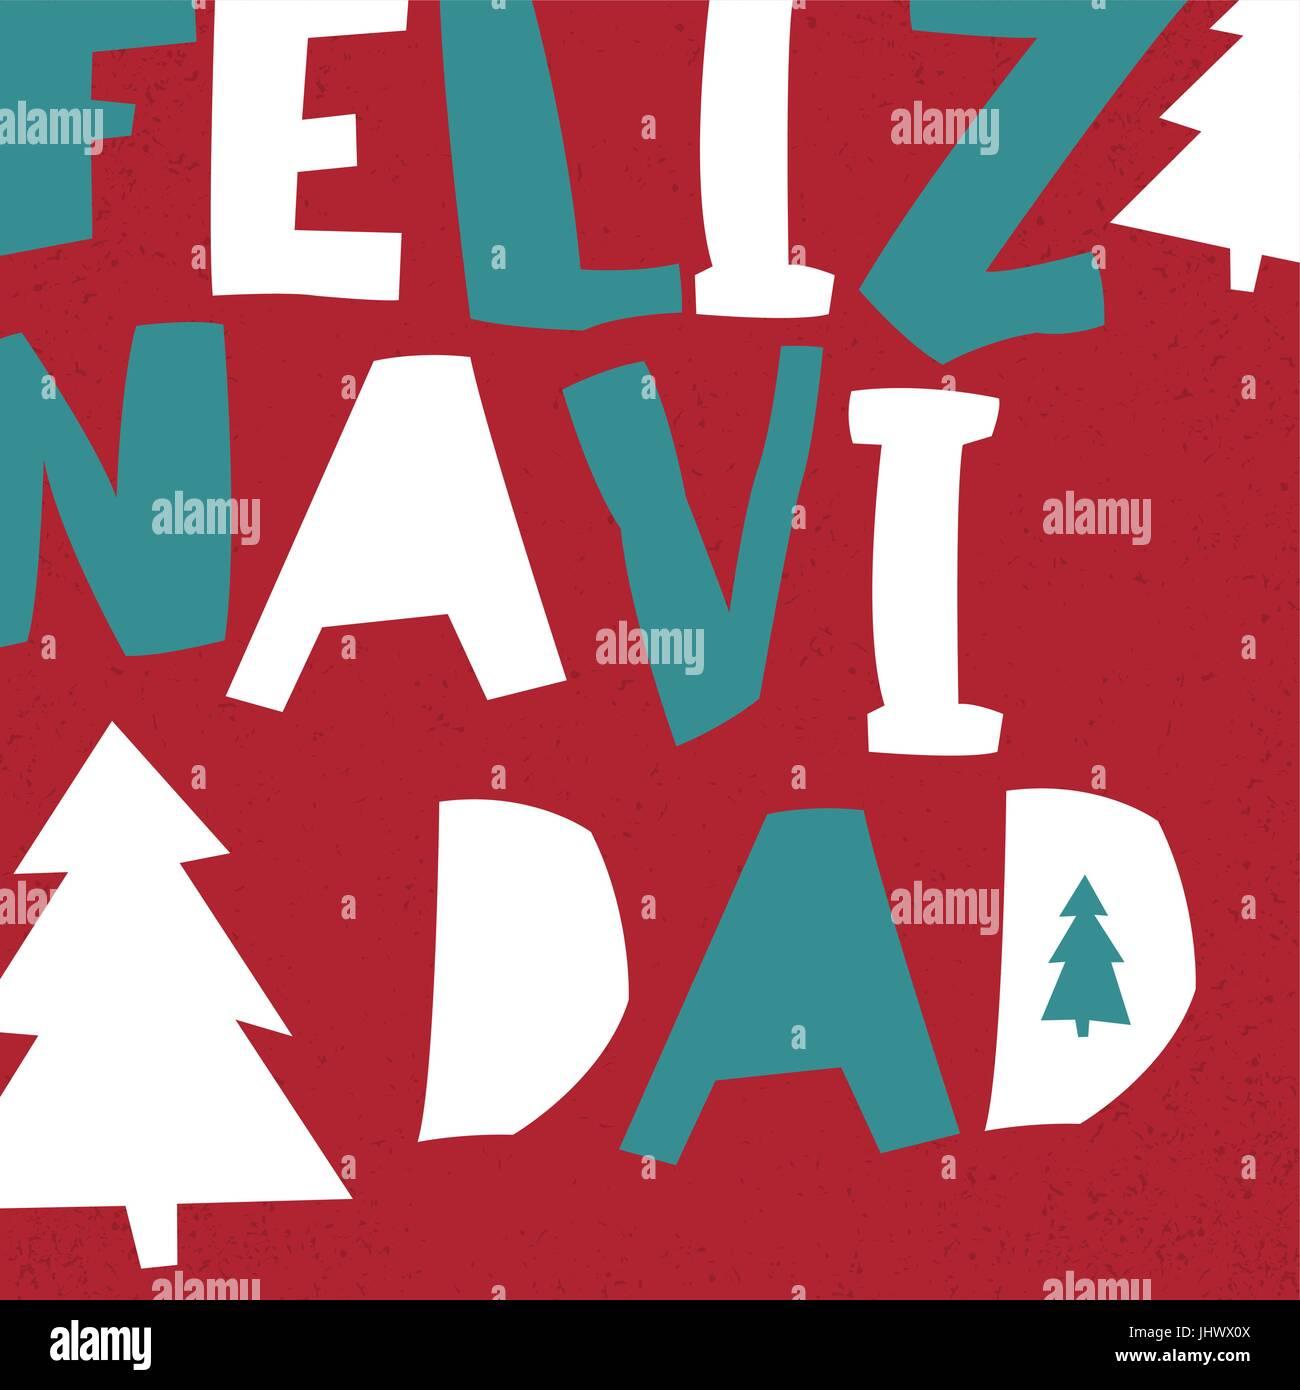 Feliz navidad vector merry christmas card template in spanish vector merry christmas card template in spanish language kristyandbryce Images